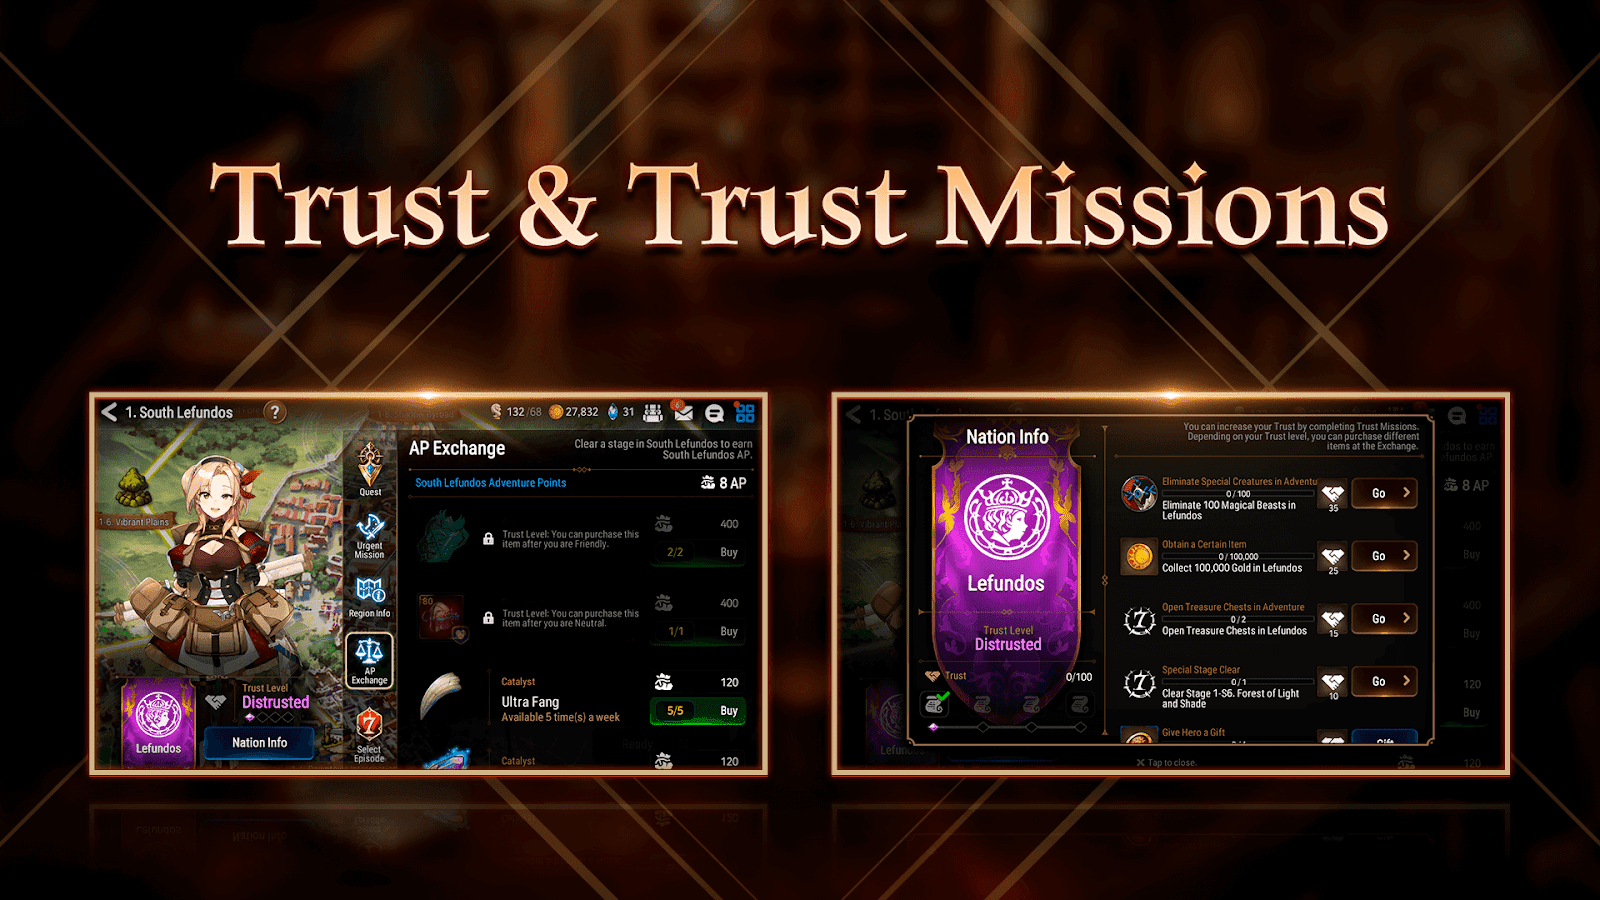 Epic Seven trust missions